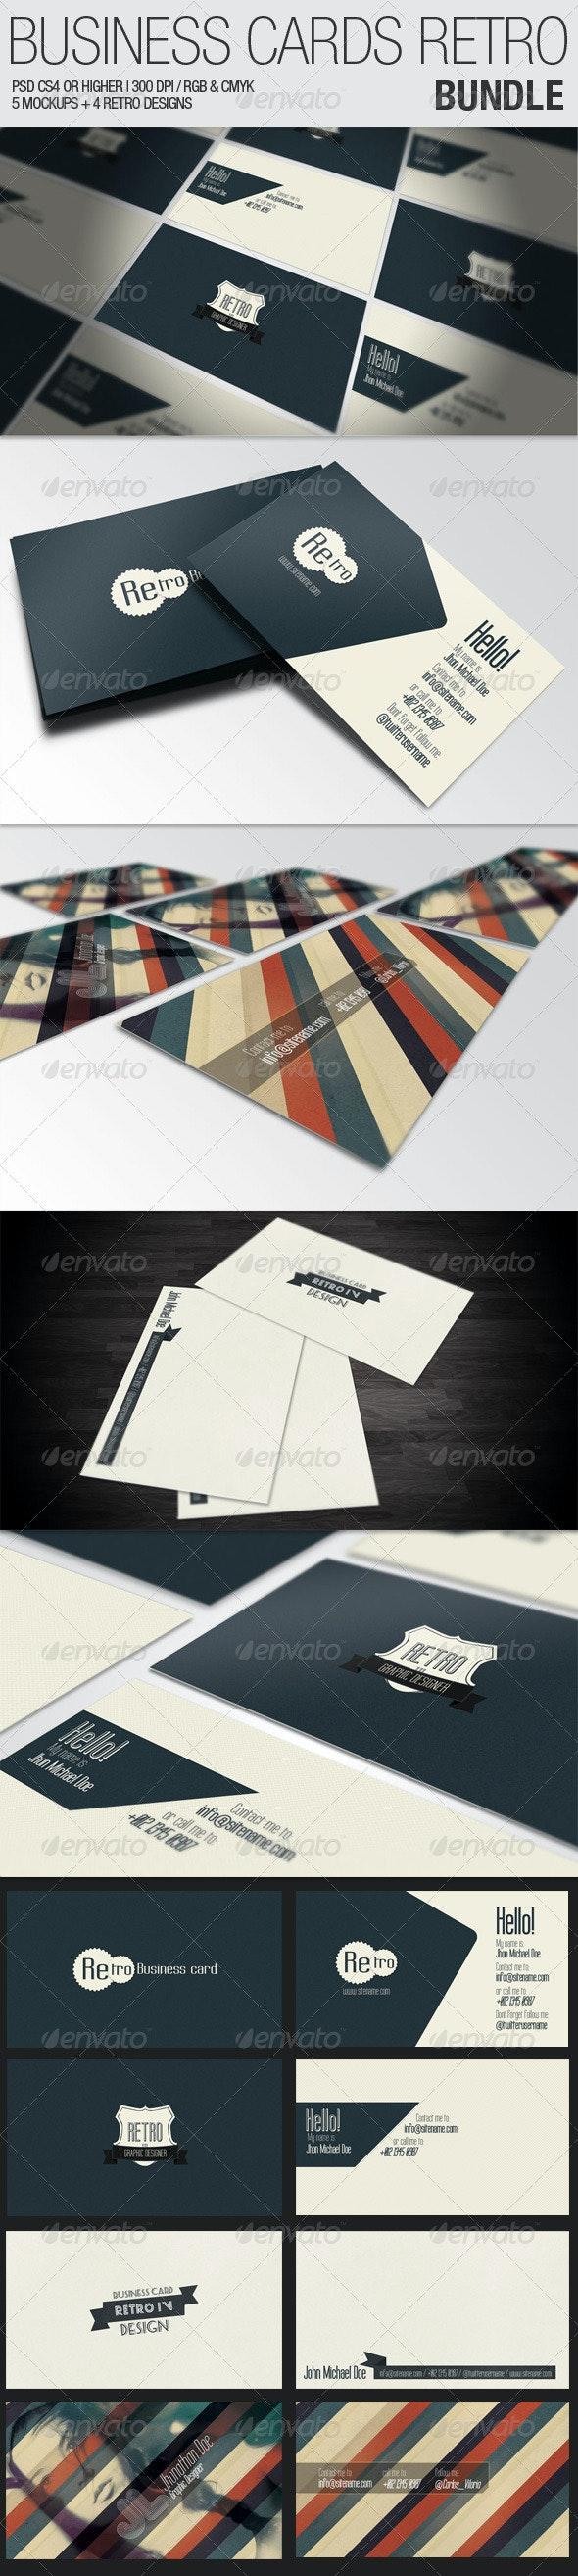 Business Cards Retro - Bundle - Business Cards Print